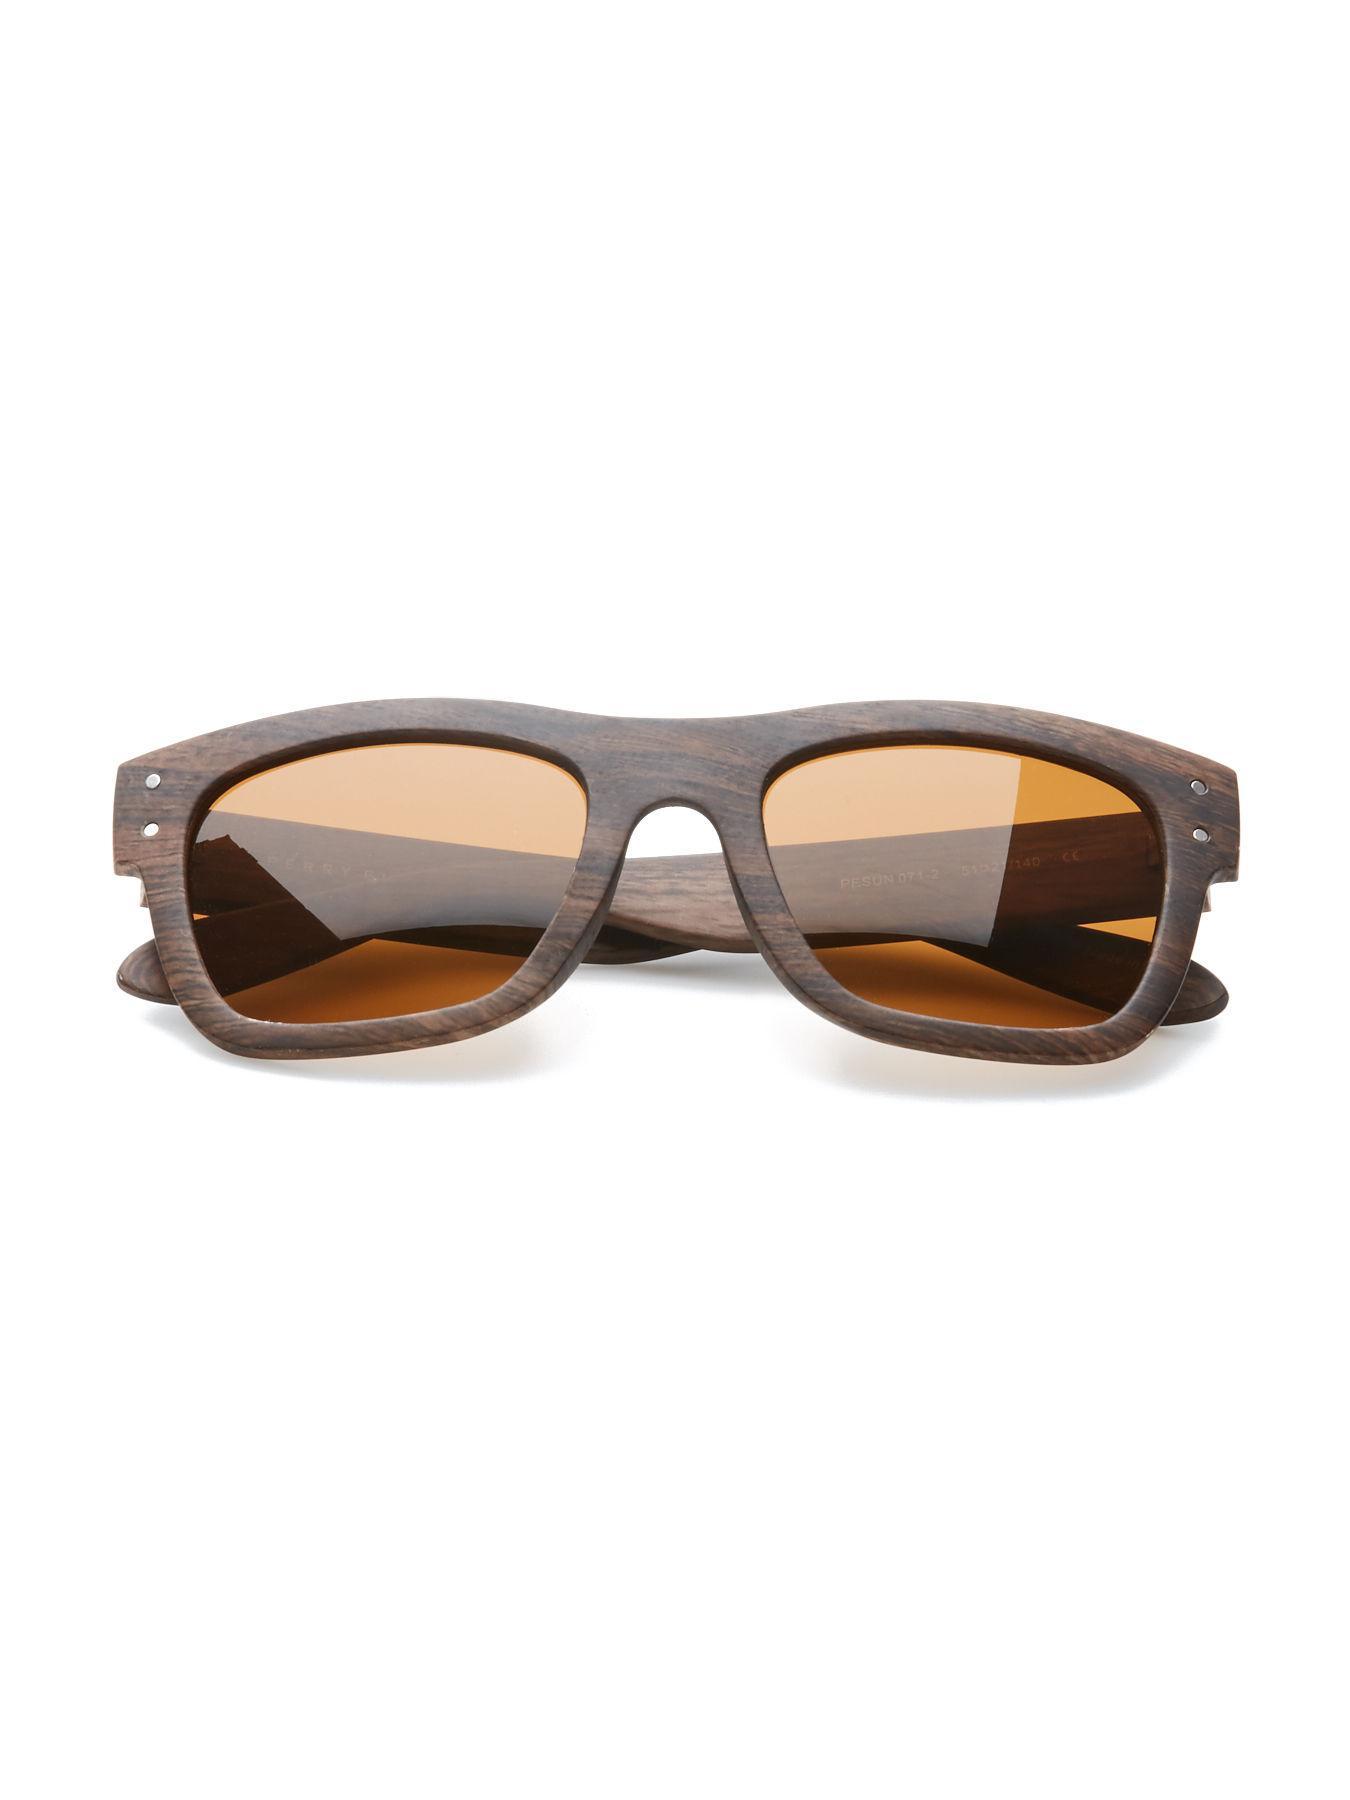 Lyst - Perry Ellis Wood Stripe Sunglasses in Brown for Men